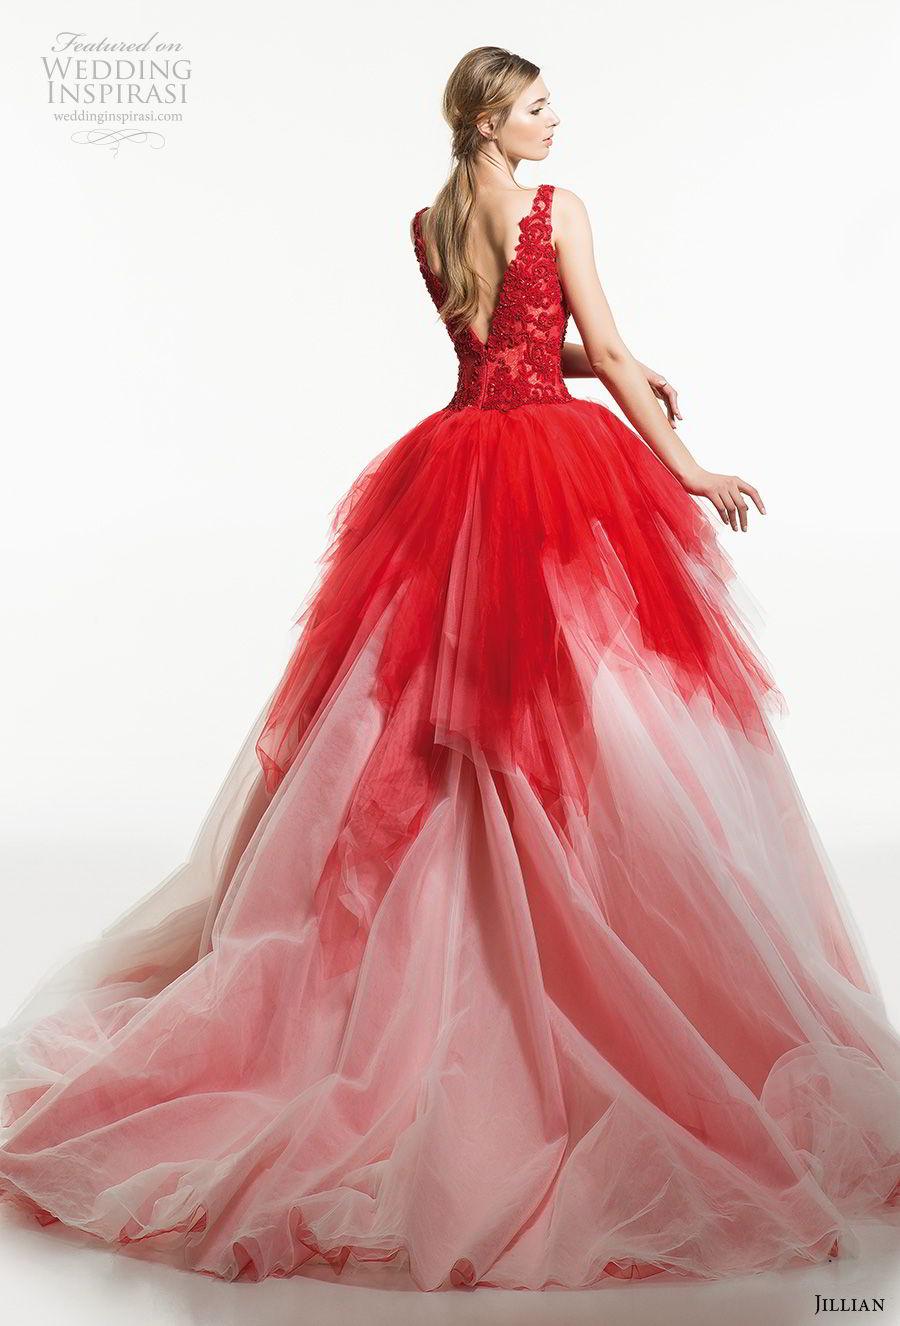 jillian 2019 bridal sleeveless deep v neck heavily embellished bodice tiered skirt red ball gown wedding dress v back chapel train (21) bv